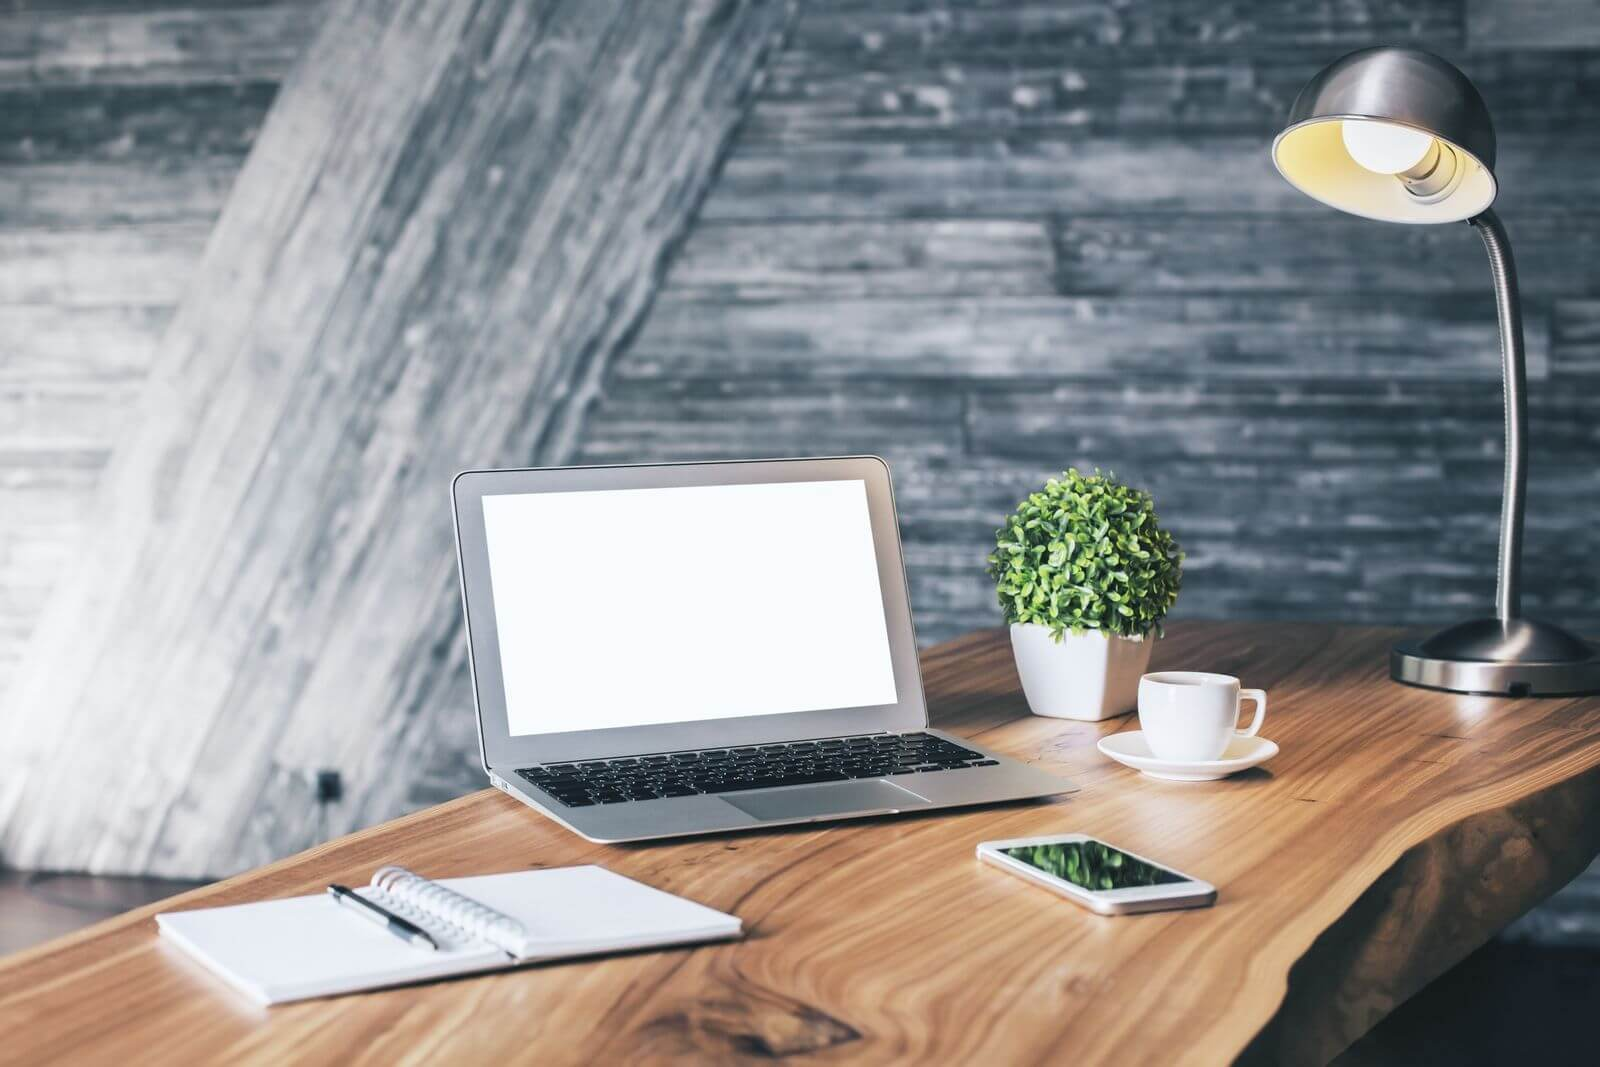 Minimalist desk with few accessories